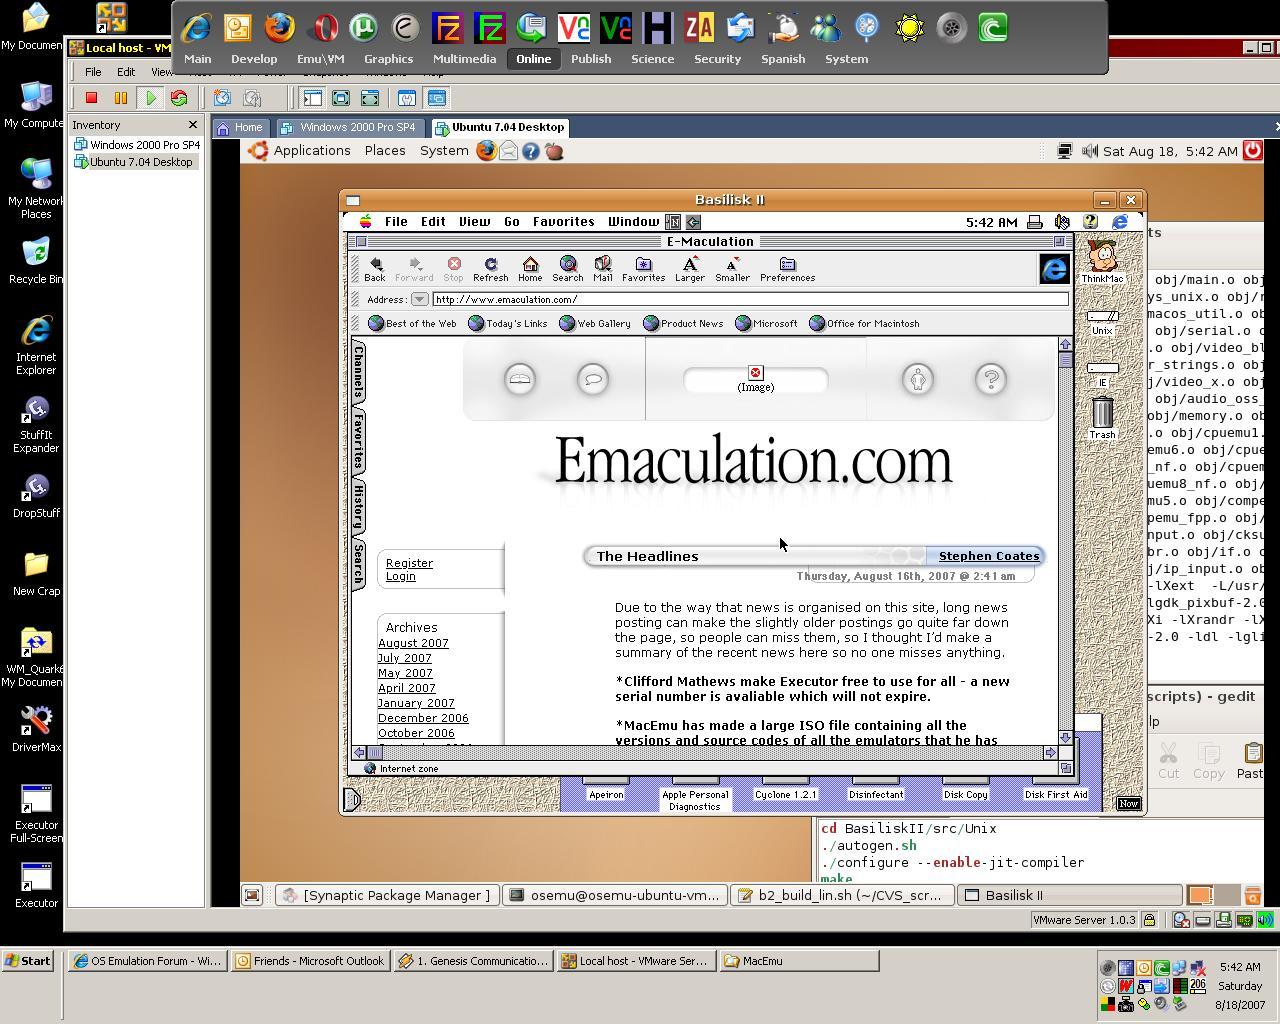 E-Maculation • Mac on Linux on Windows Screenshot - Basilisk II